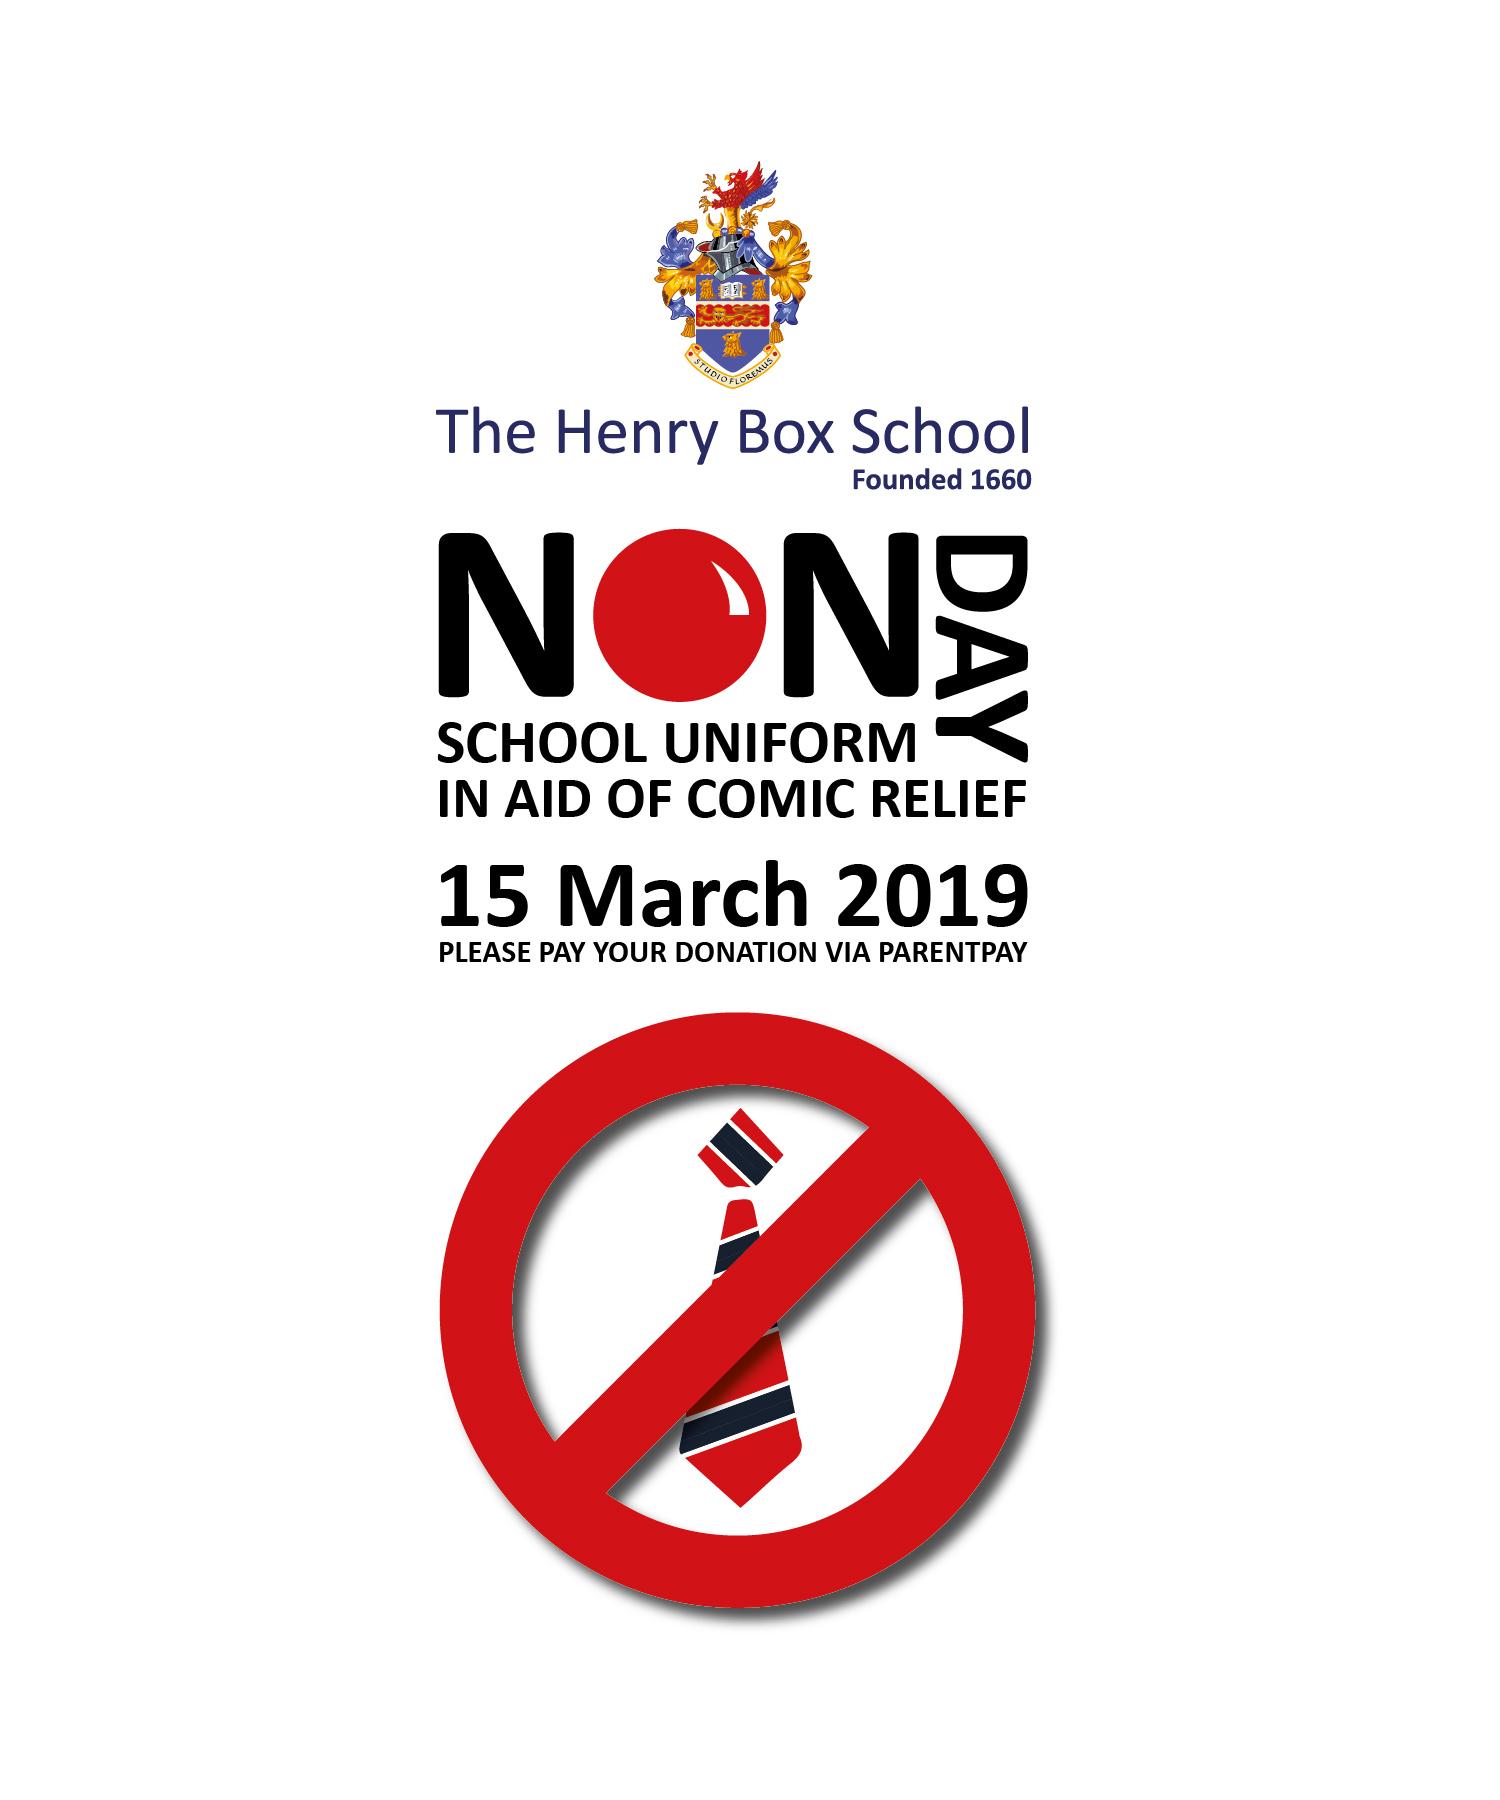 Non school uniform logo